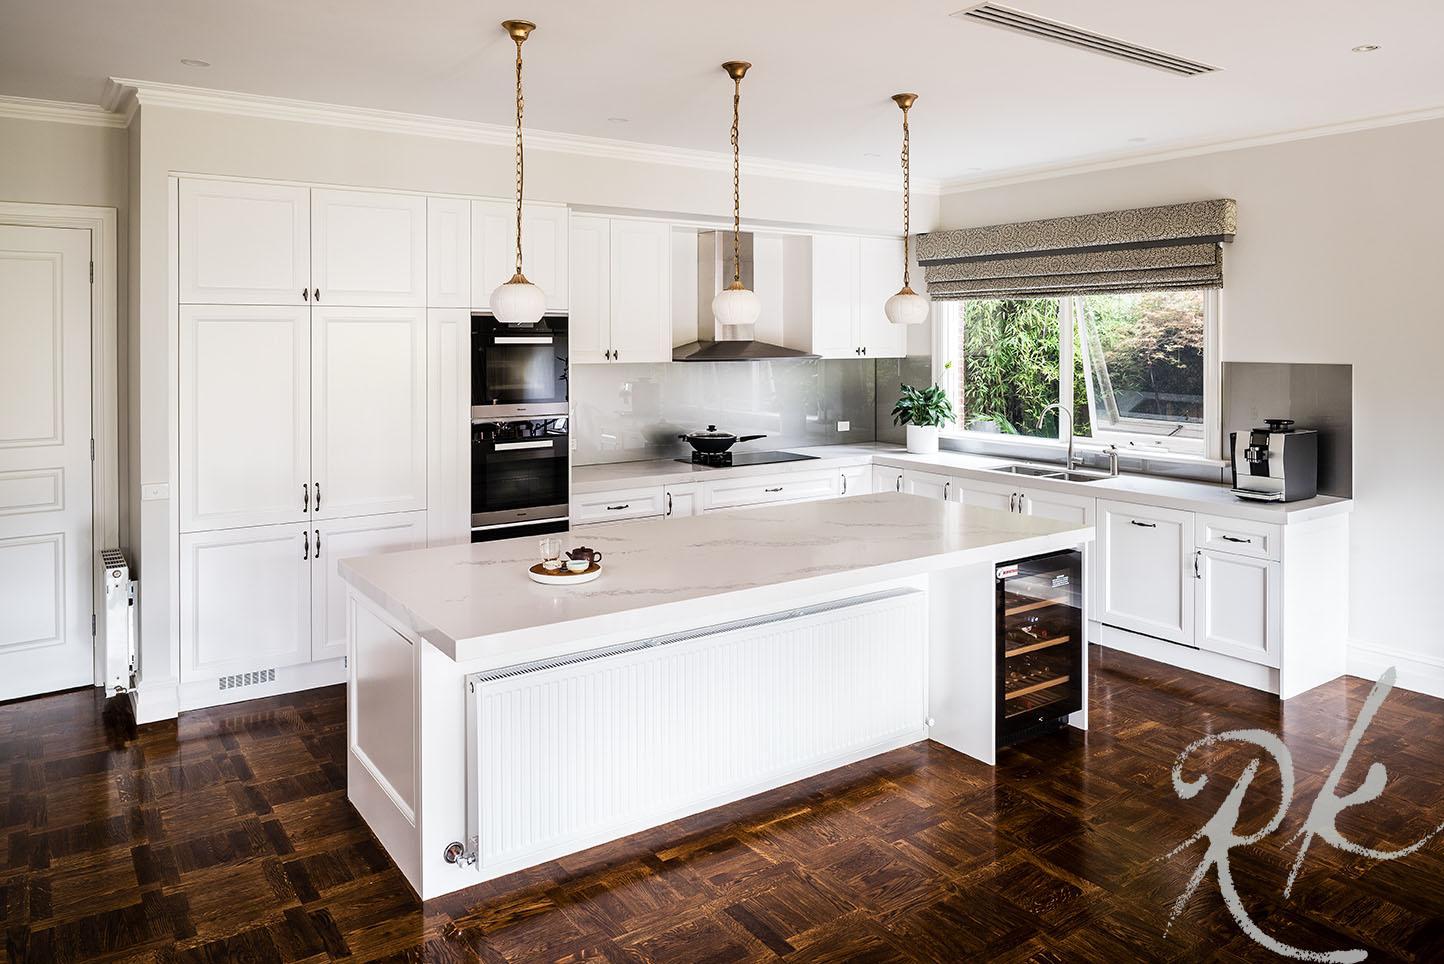 Beautiful kitchen designer inspired kitchen in Melbourne's Hawthorn East